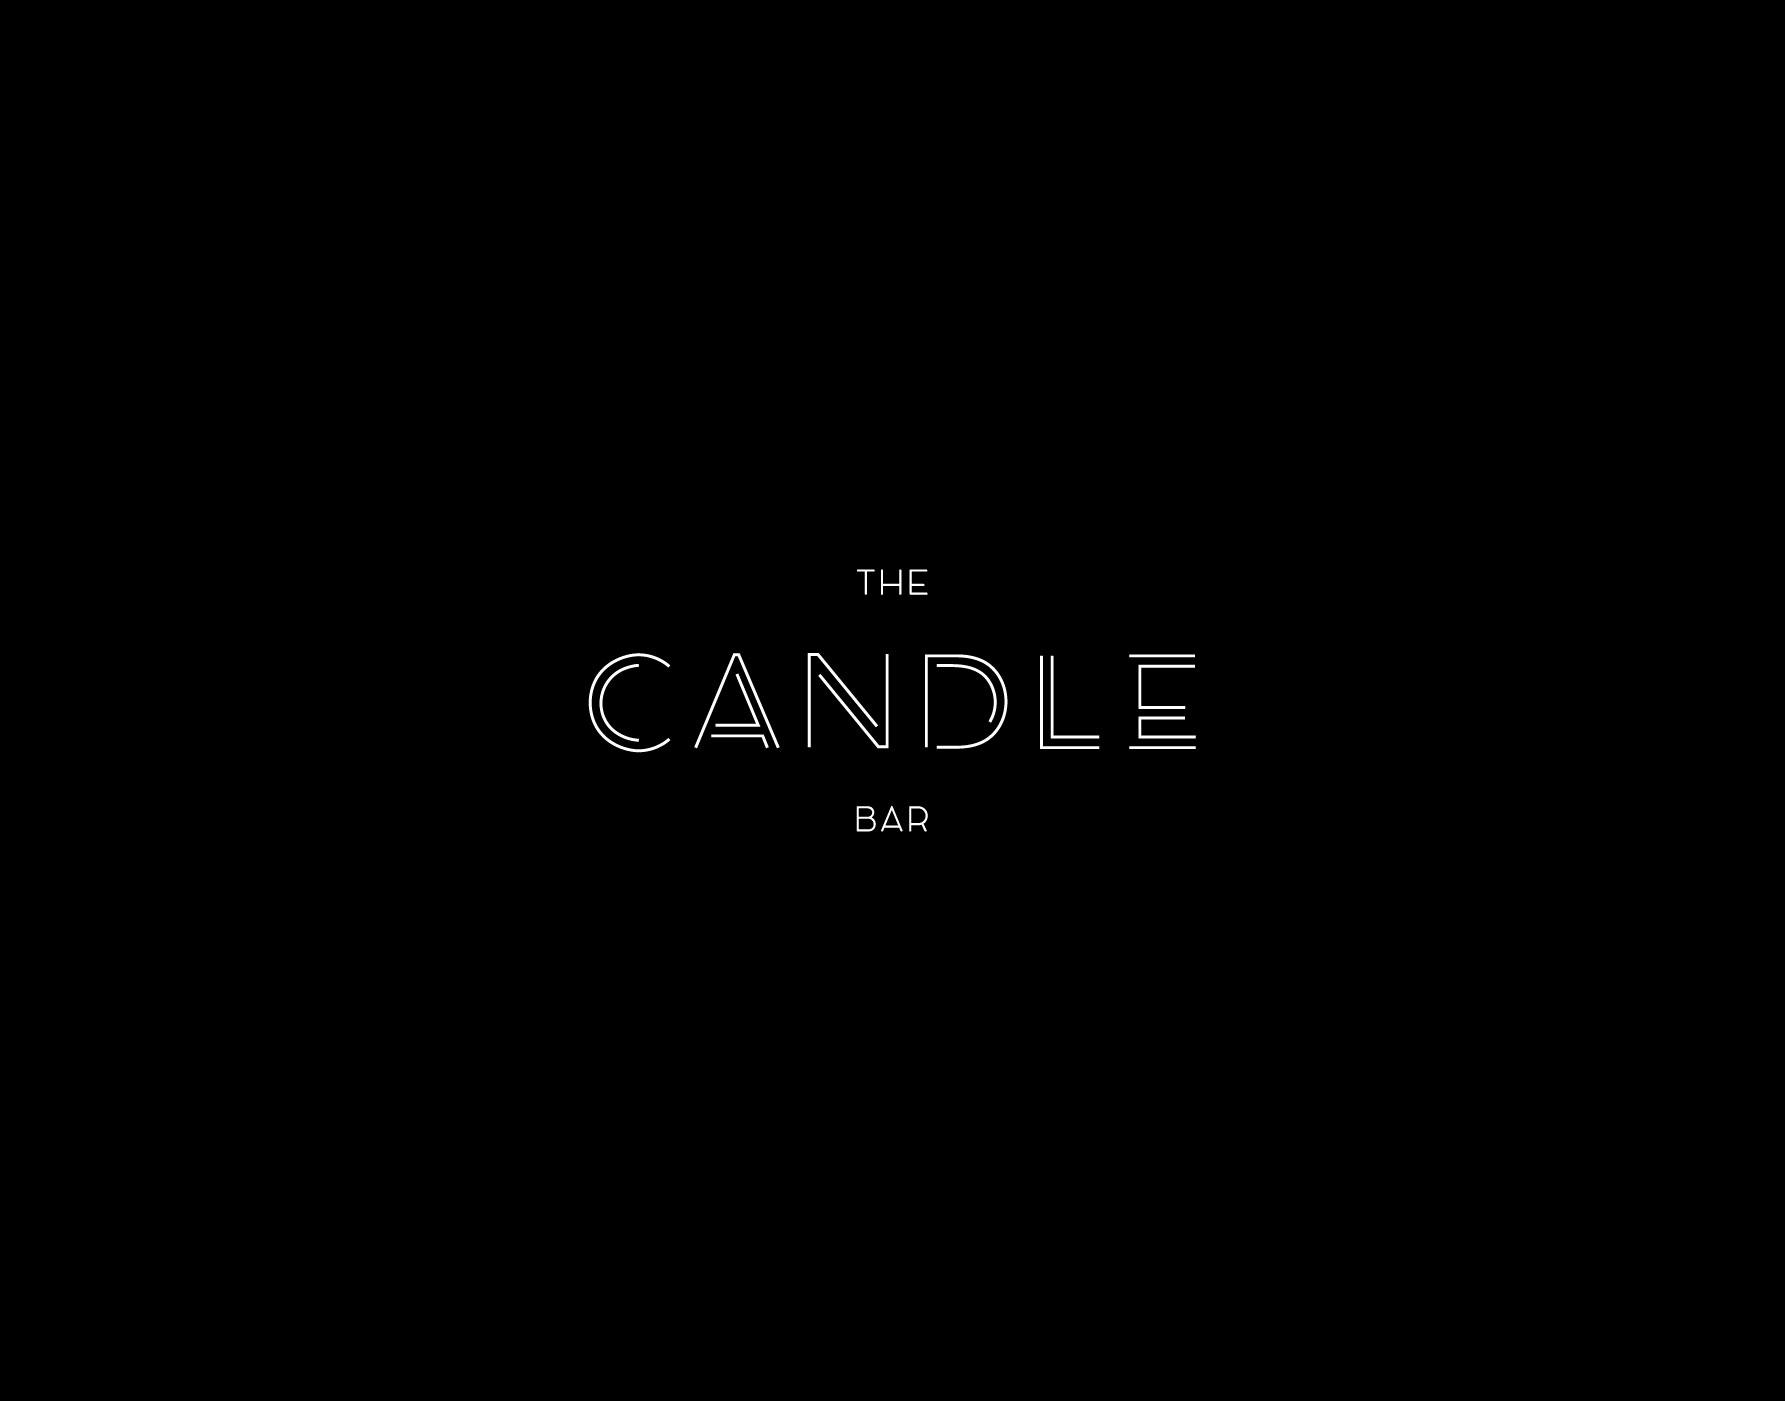 CANDLE-BAR.jpg